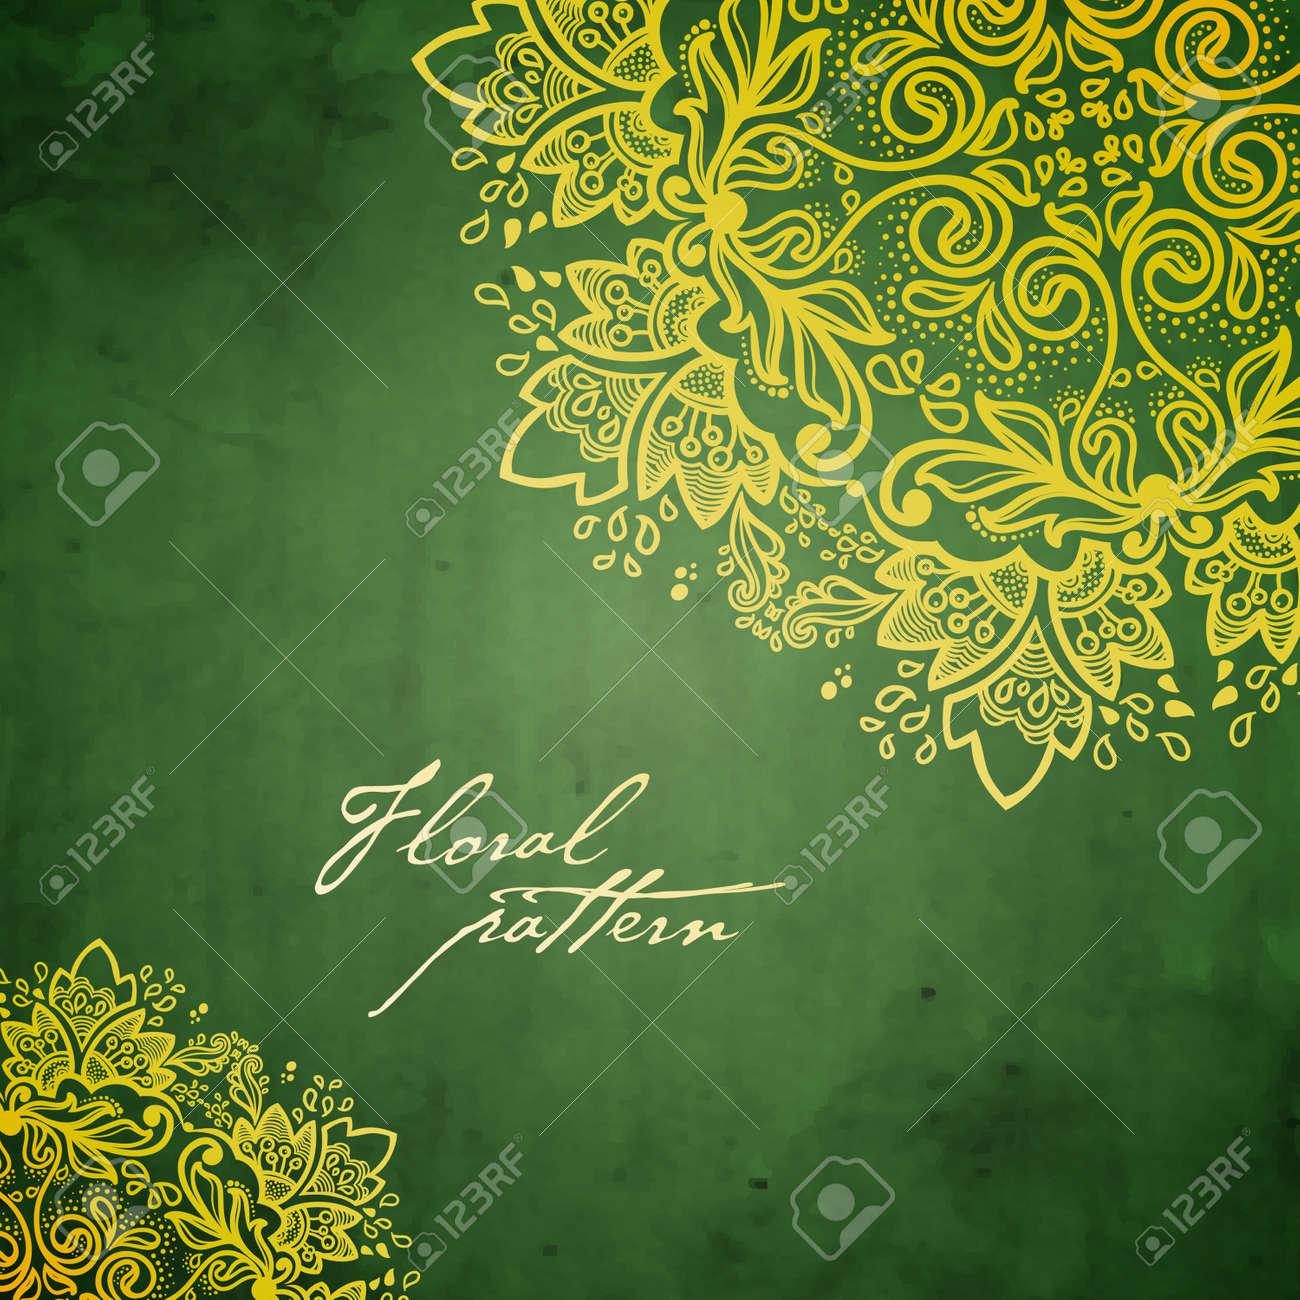 Ornamental round floral lace background kaleidoscopic floral pattern, mandala - 16983839